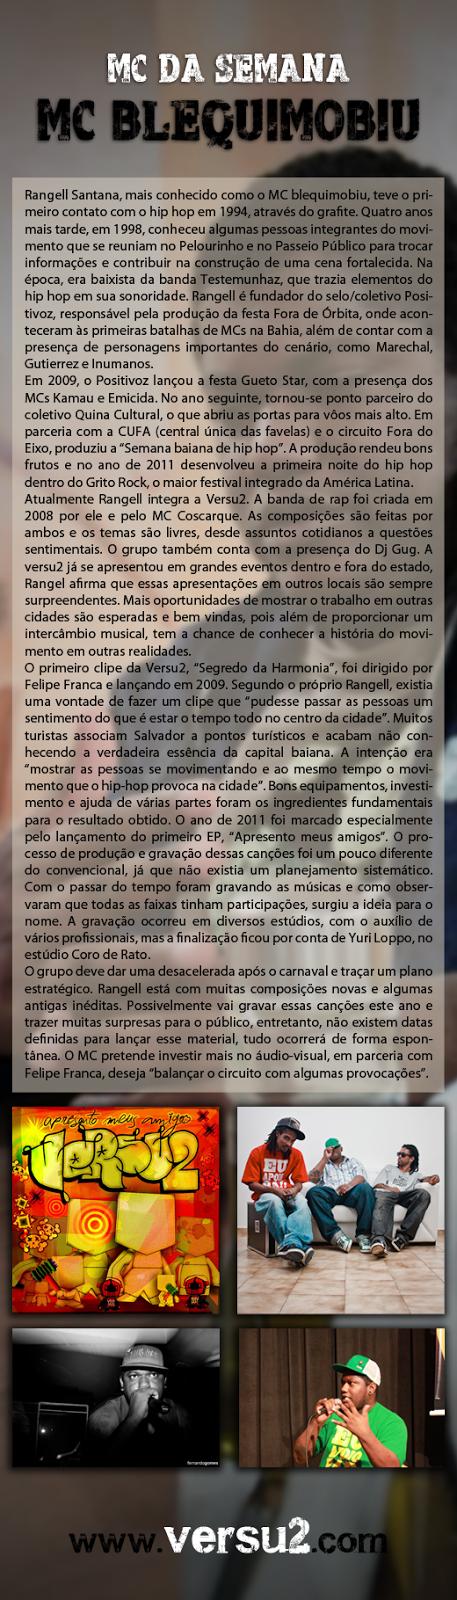 Jornalismo Digital Pollyana Ferrari Pdf